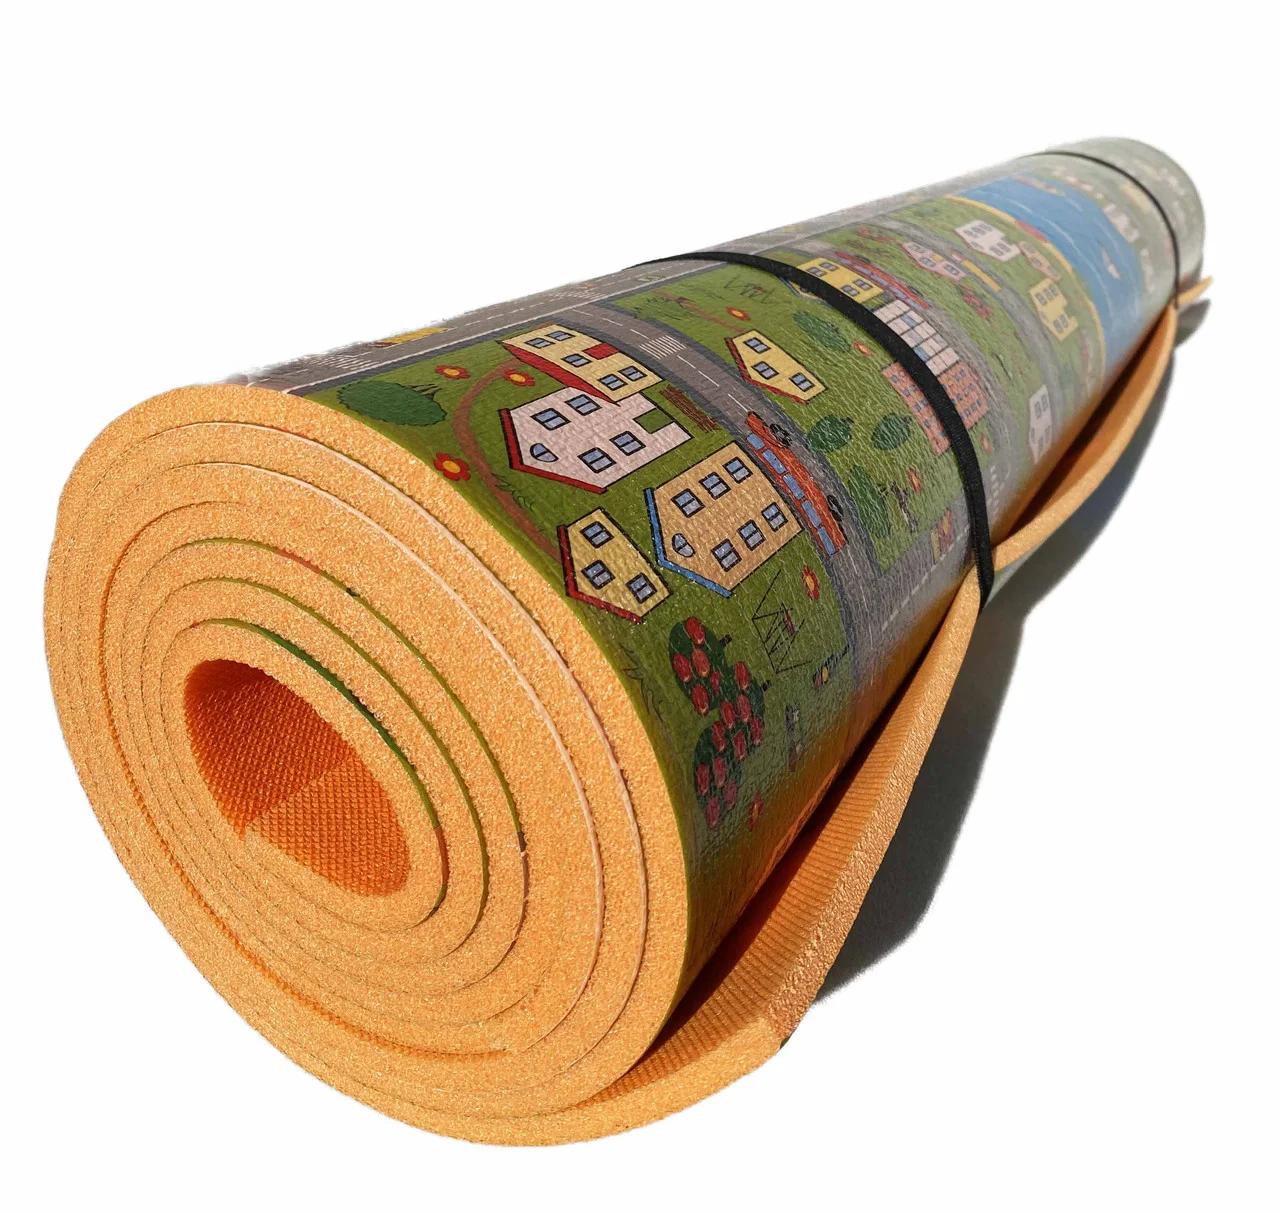 Детский коврик 3000х1200х8мм  теплоизоляционный, развивающий, игровой коврик